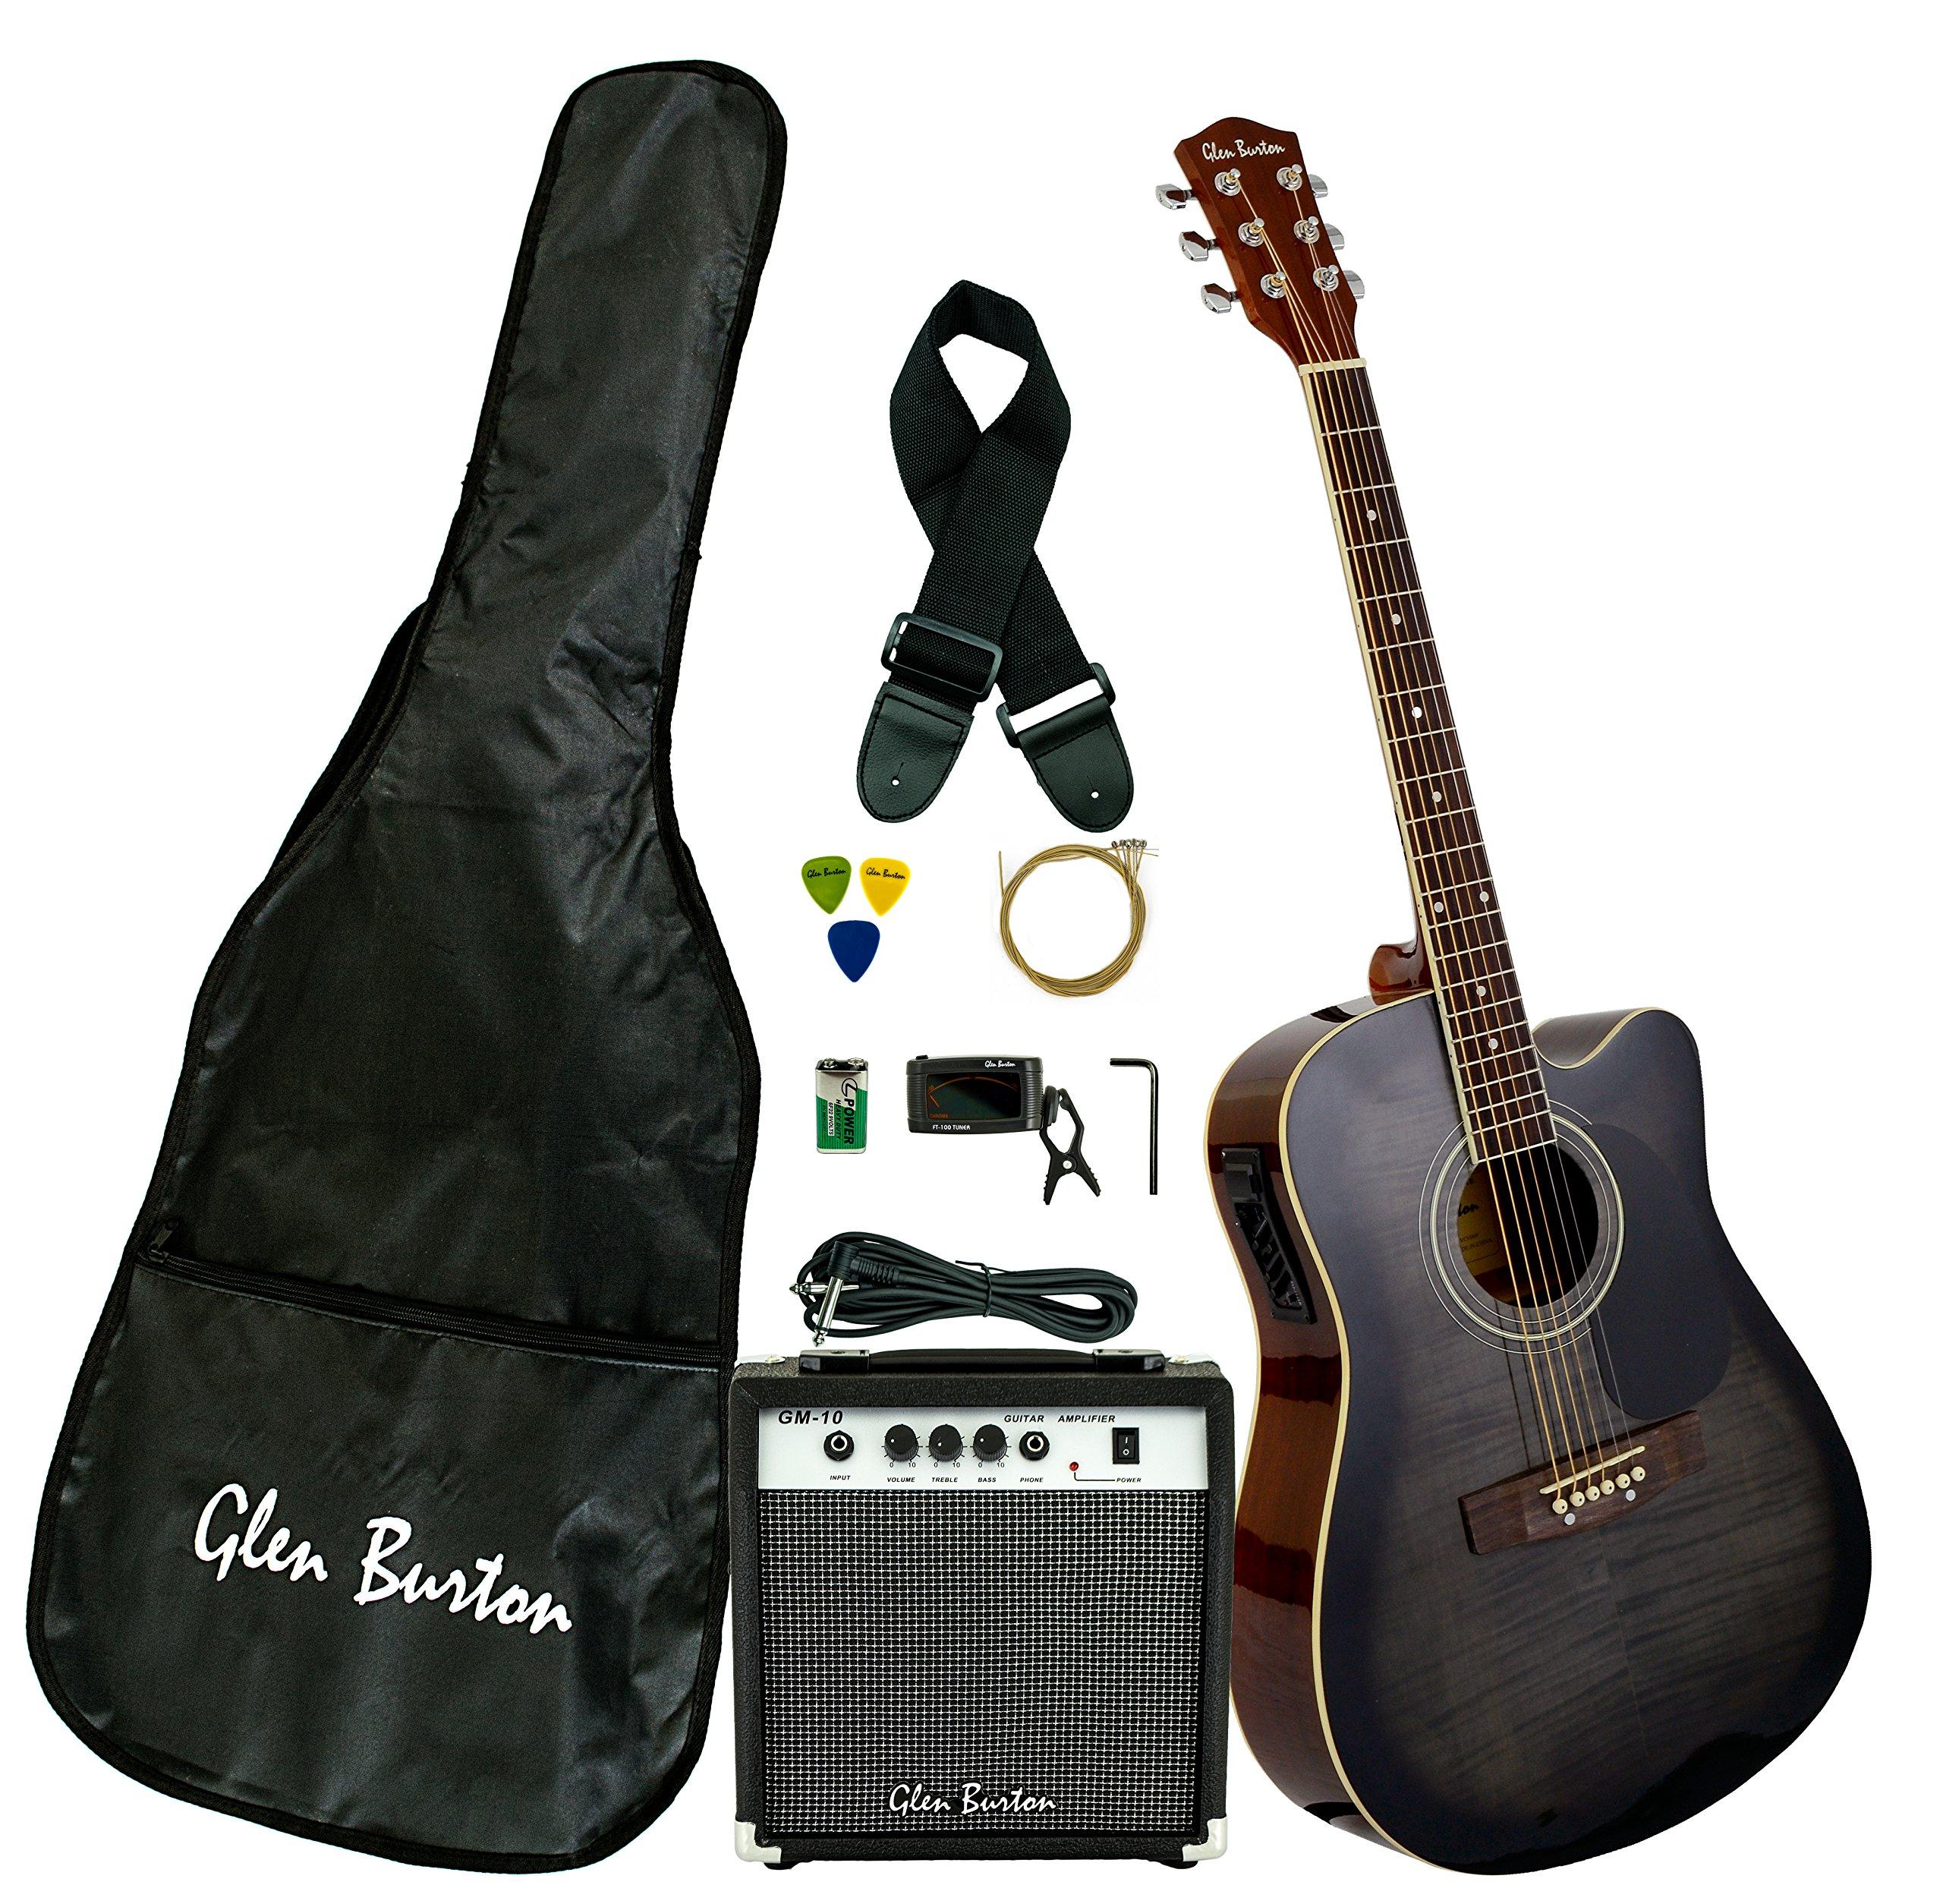 Glen Burton GA204BCO-BK Acoustic Electric Cutaway Guitar, Black by Glen Burton